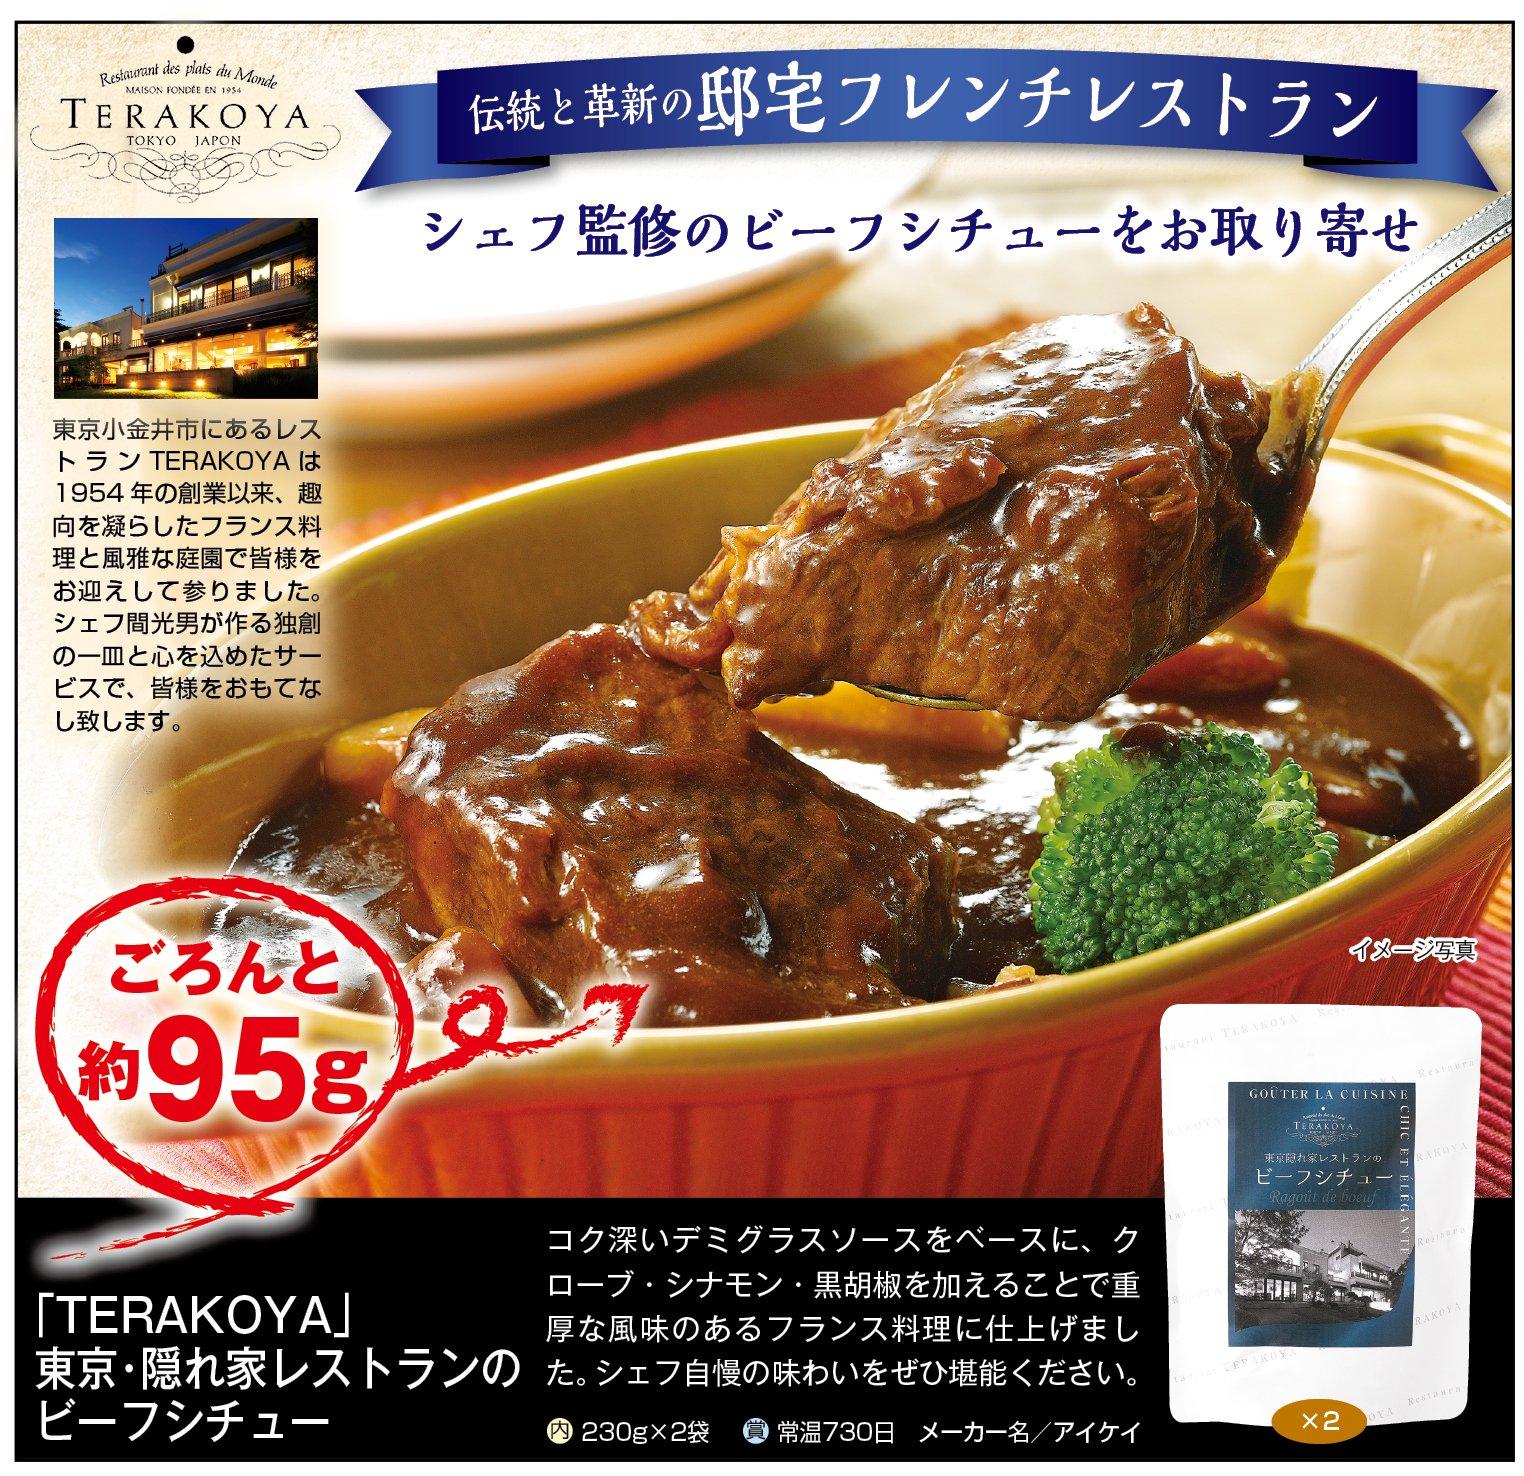 「TERAKOYA」東京・隠れ家レストランのビーフシチュー 230g×2袋